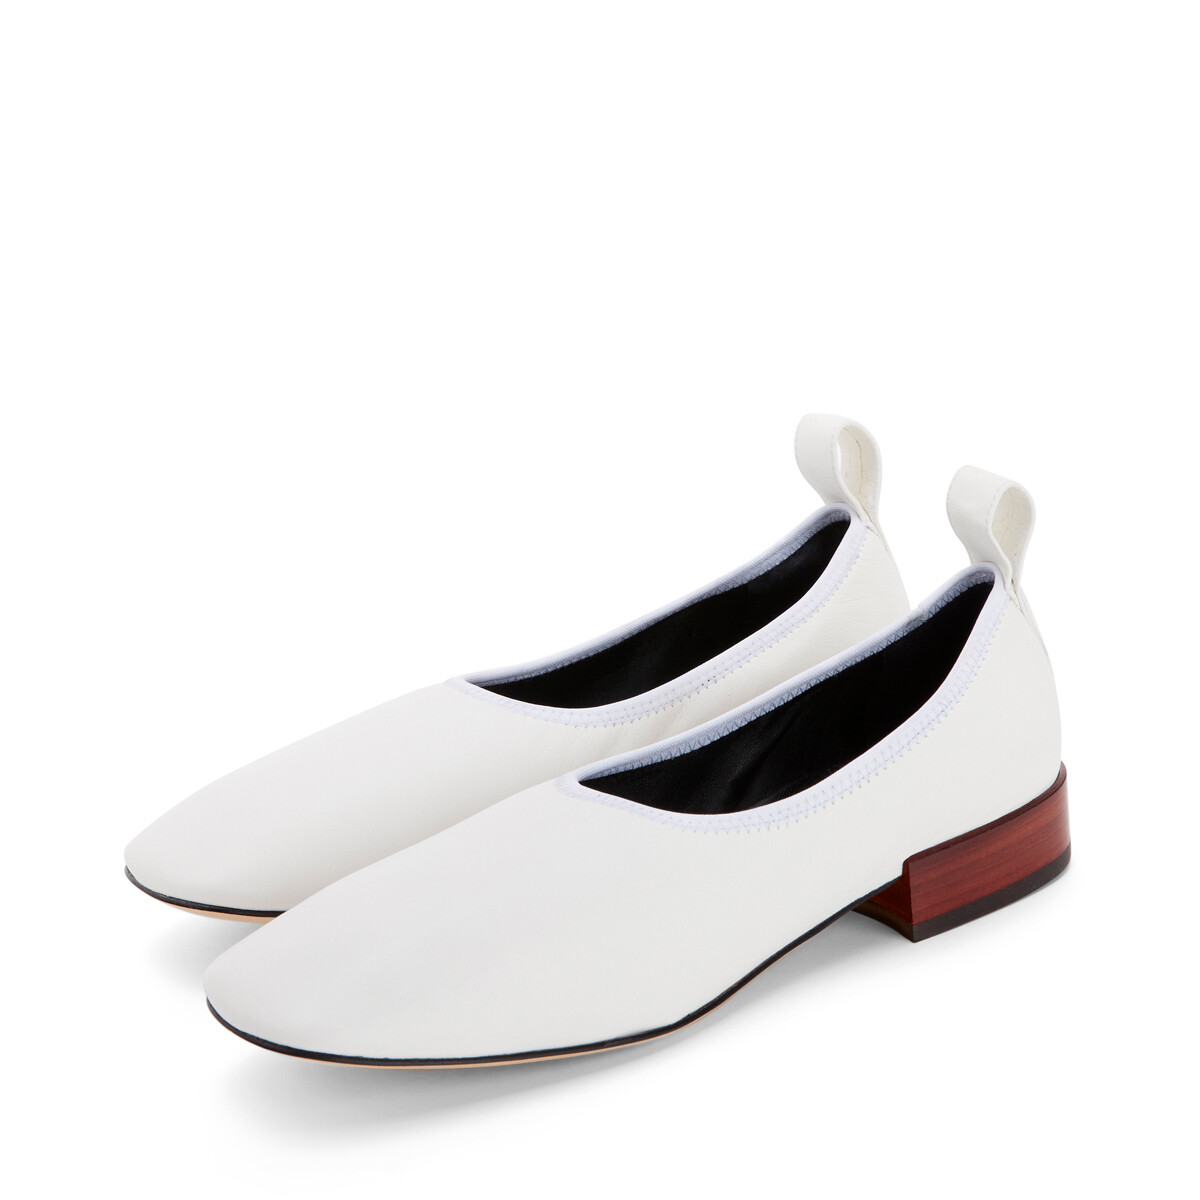 LOEWE 软芭蕾舞鞋 25 绵白色 front